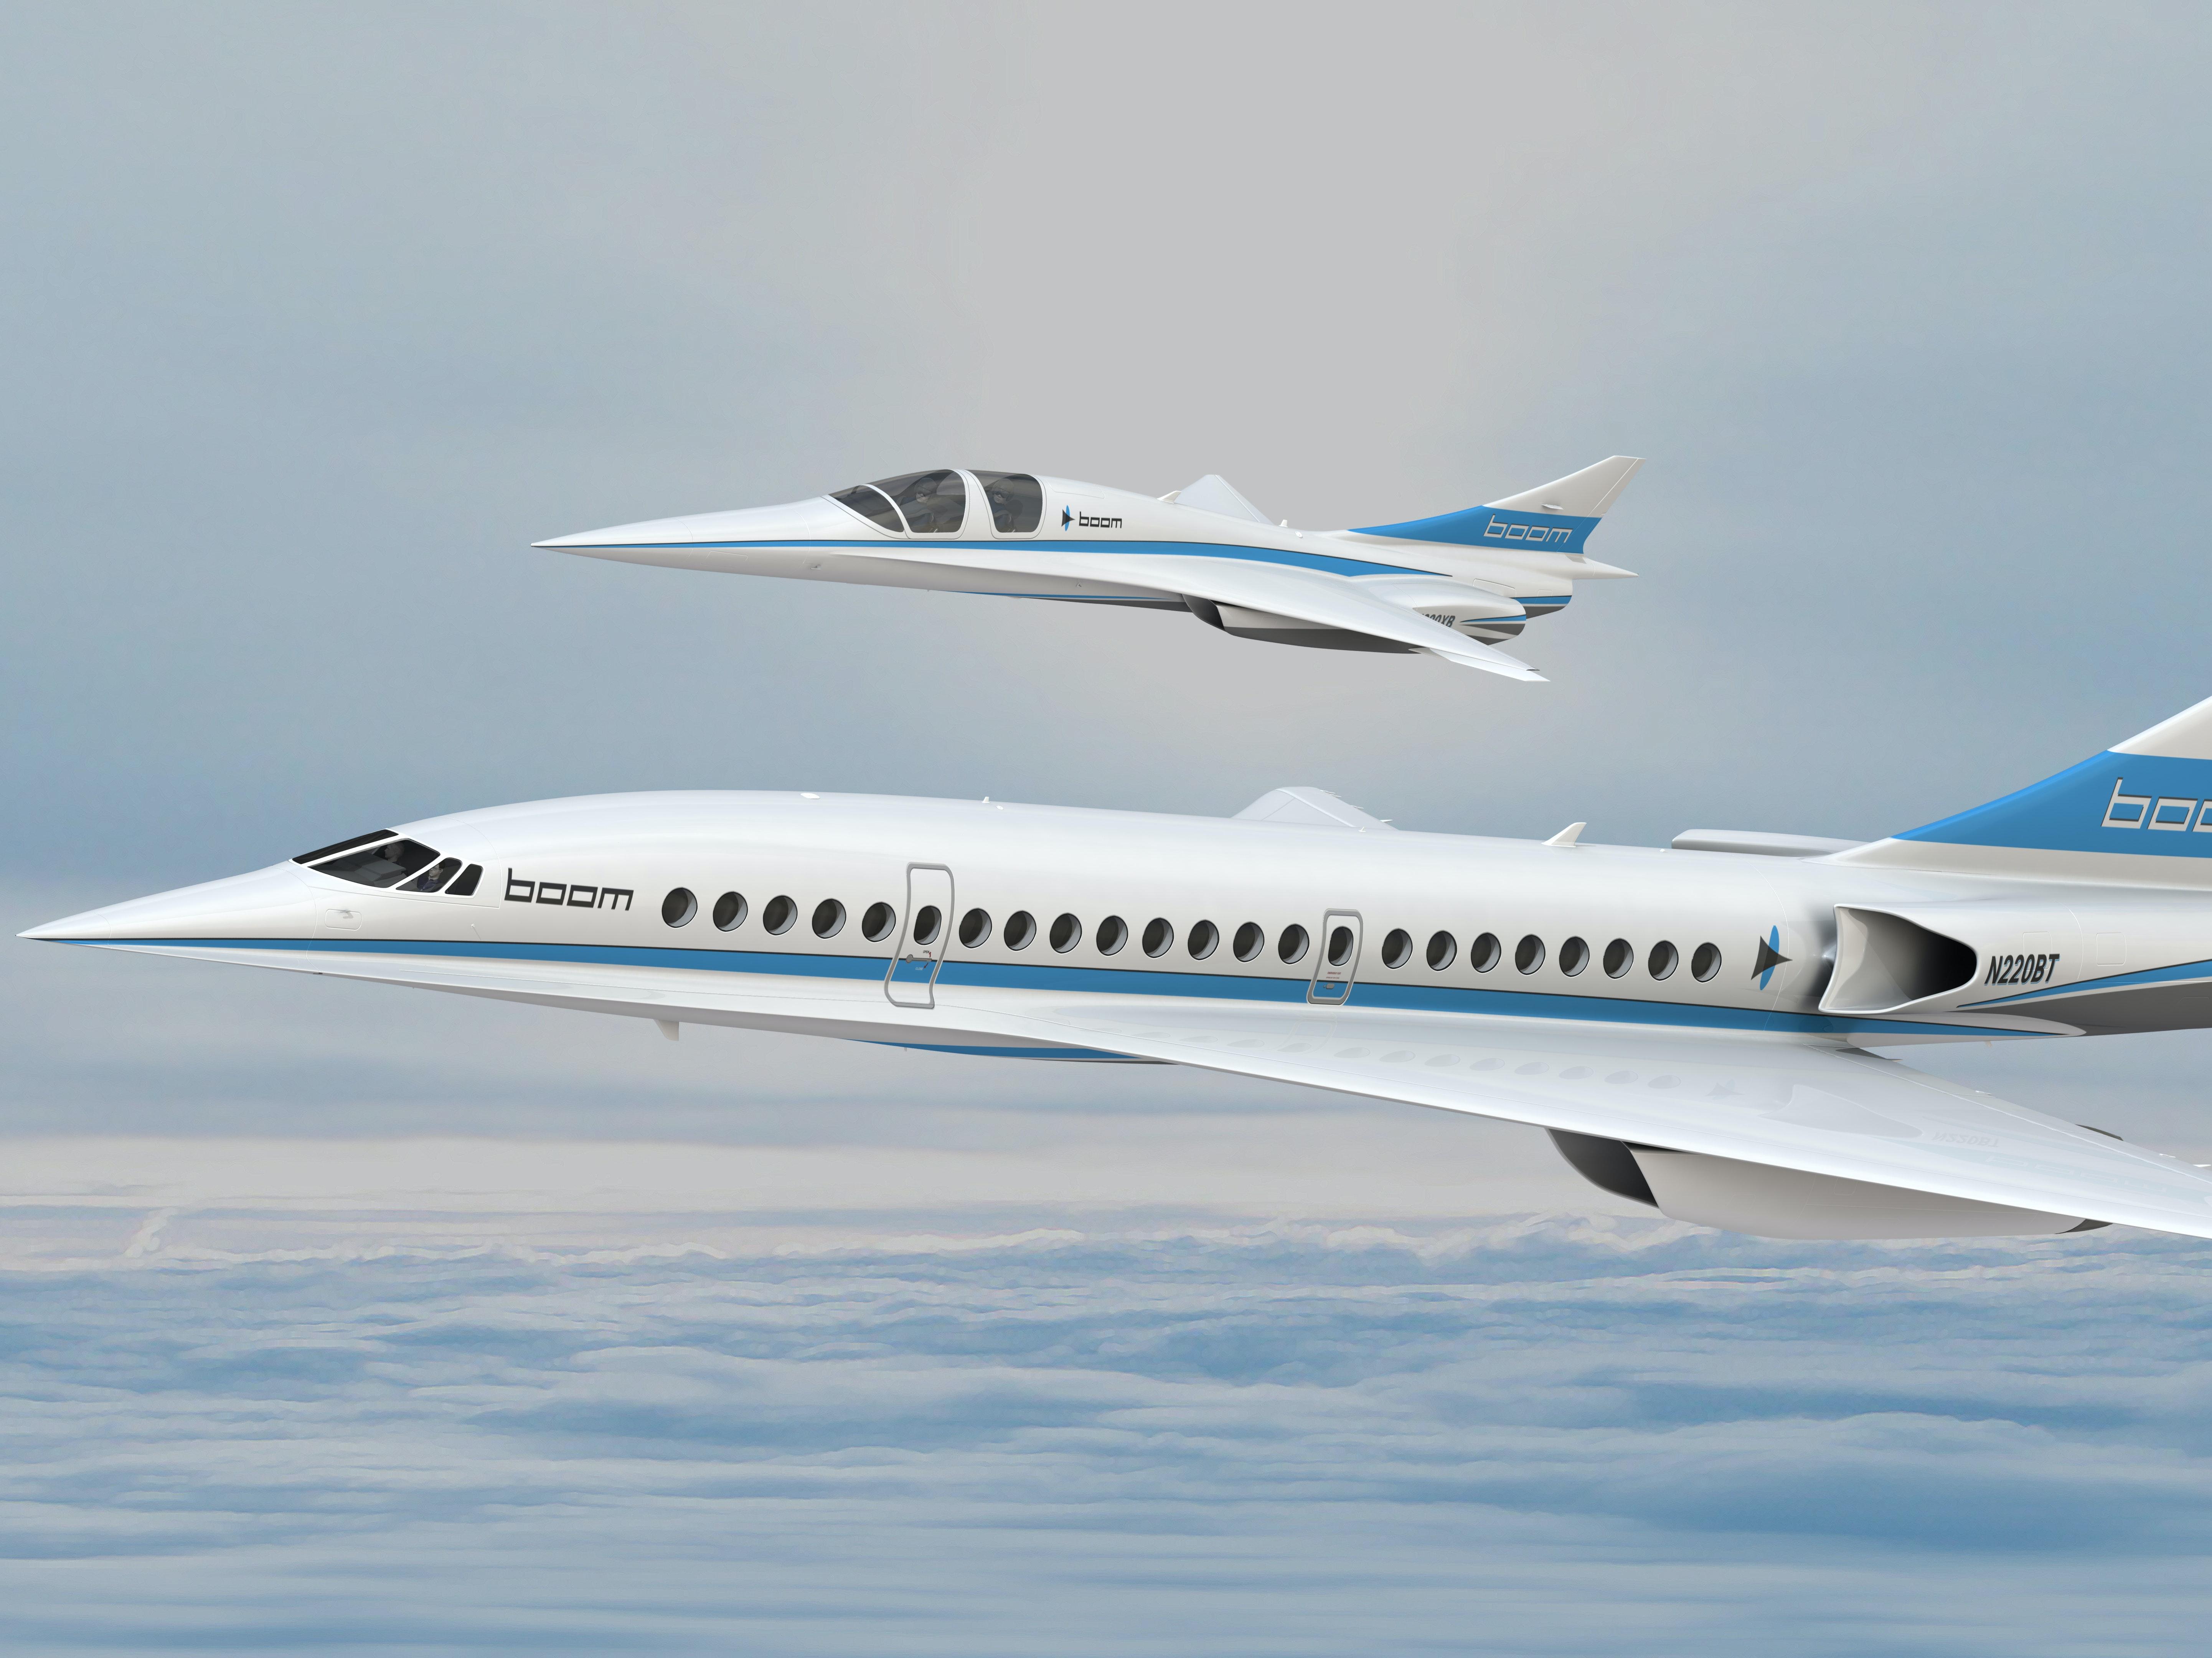 xb-1 and boom aircraft